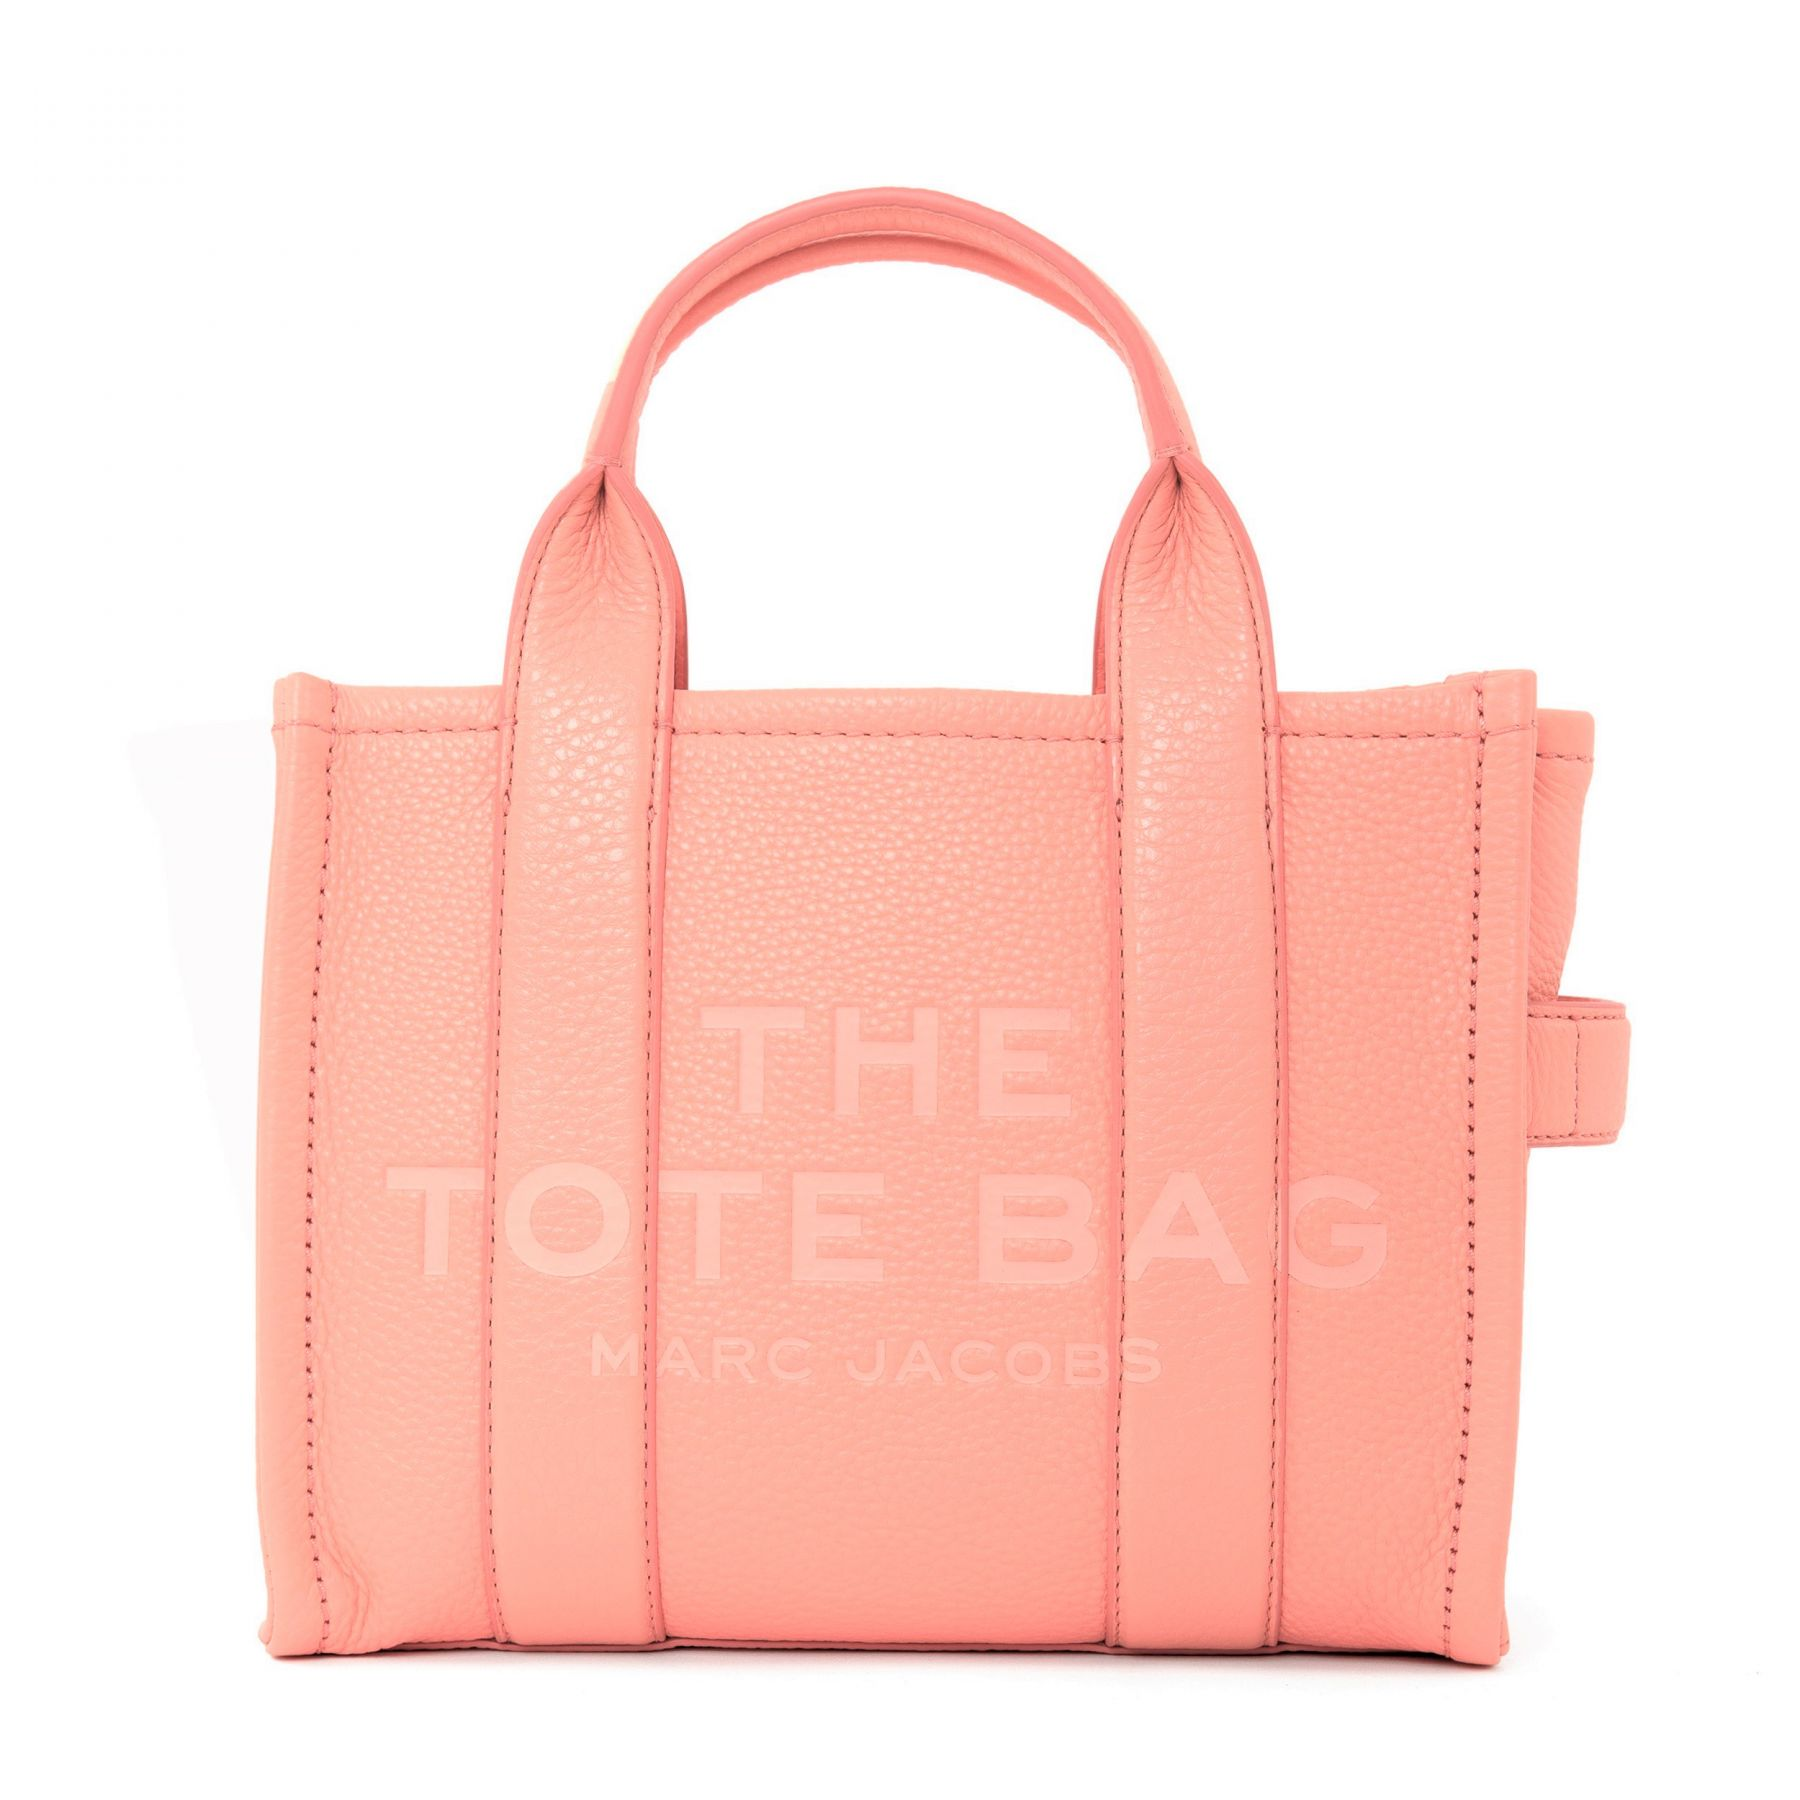 Сумка Marc Jacobs The Mini Tote Bag персиковая